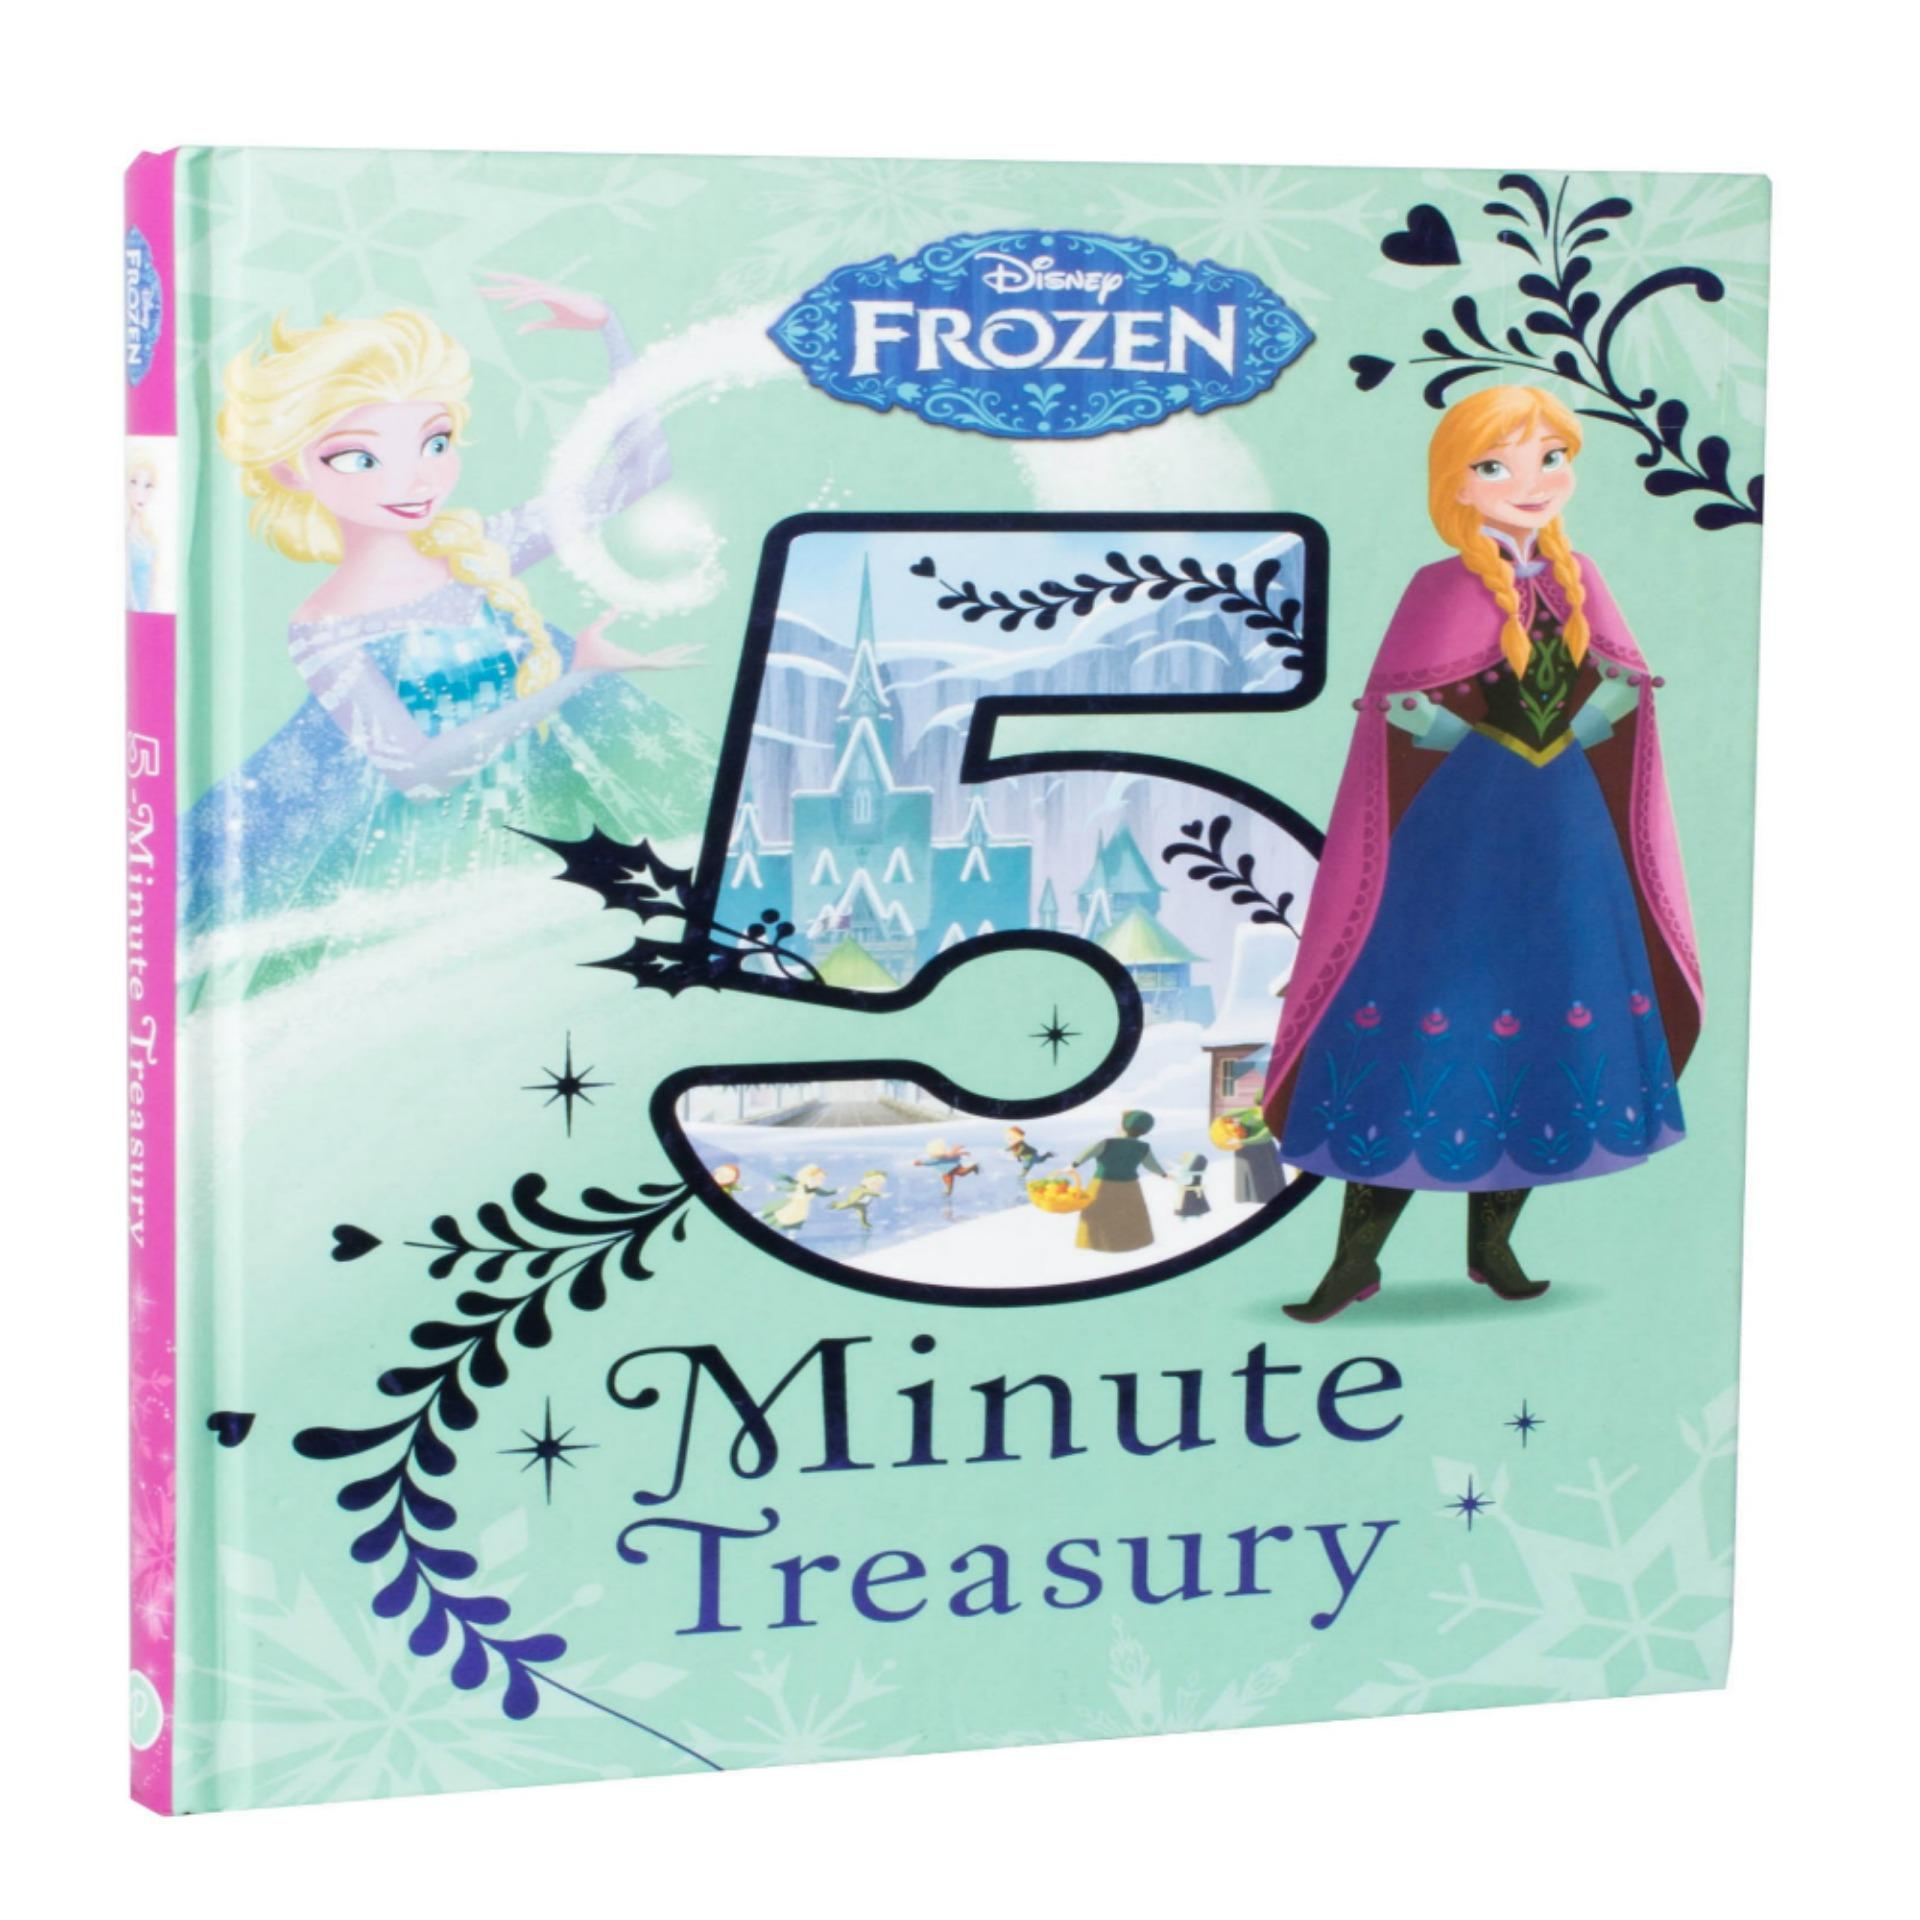 Disney Frozen 5 Minute Treasury